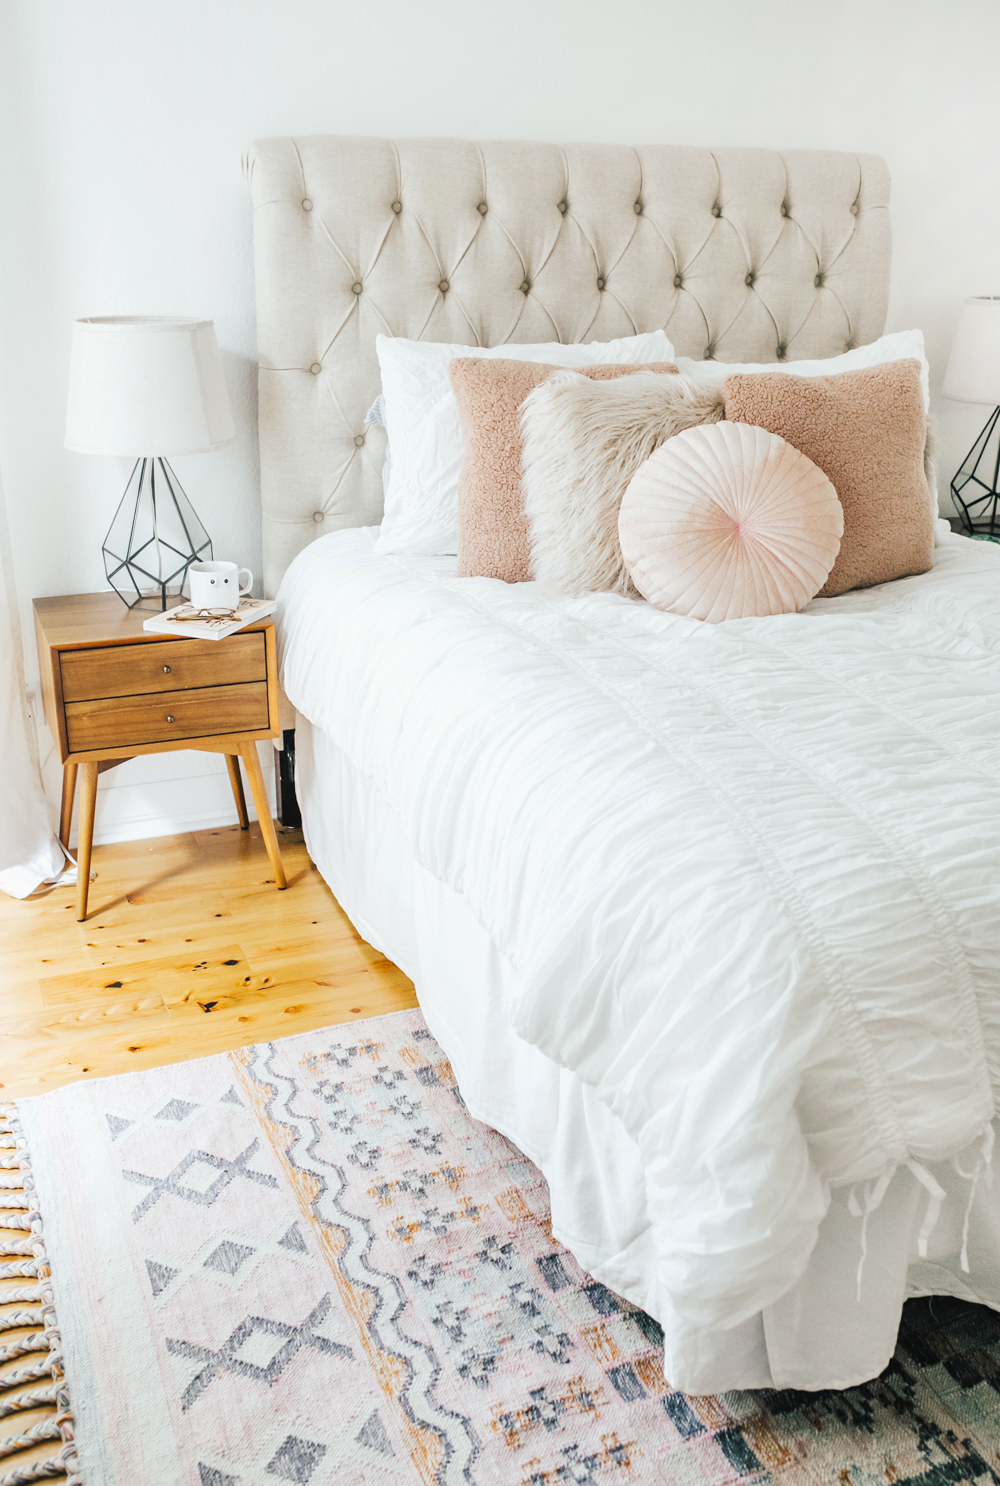 livvyland-blog-olivia-watson-bedroom-bedding-decor-decoration-blush-white-interiors-urban-outfitters-5